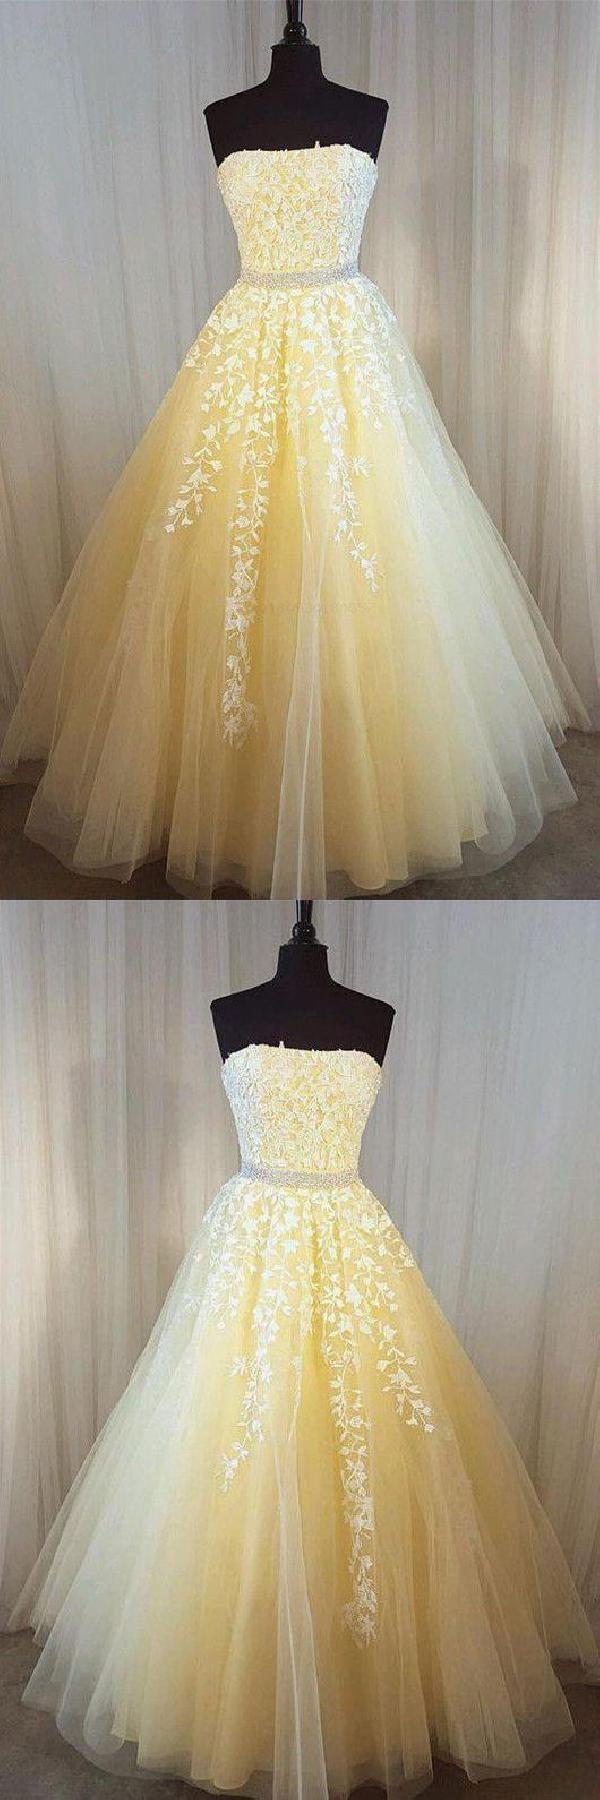 Long evening dresses evening dresses lace prom dresses prom